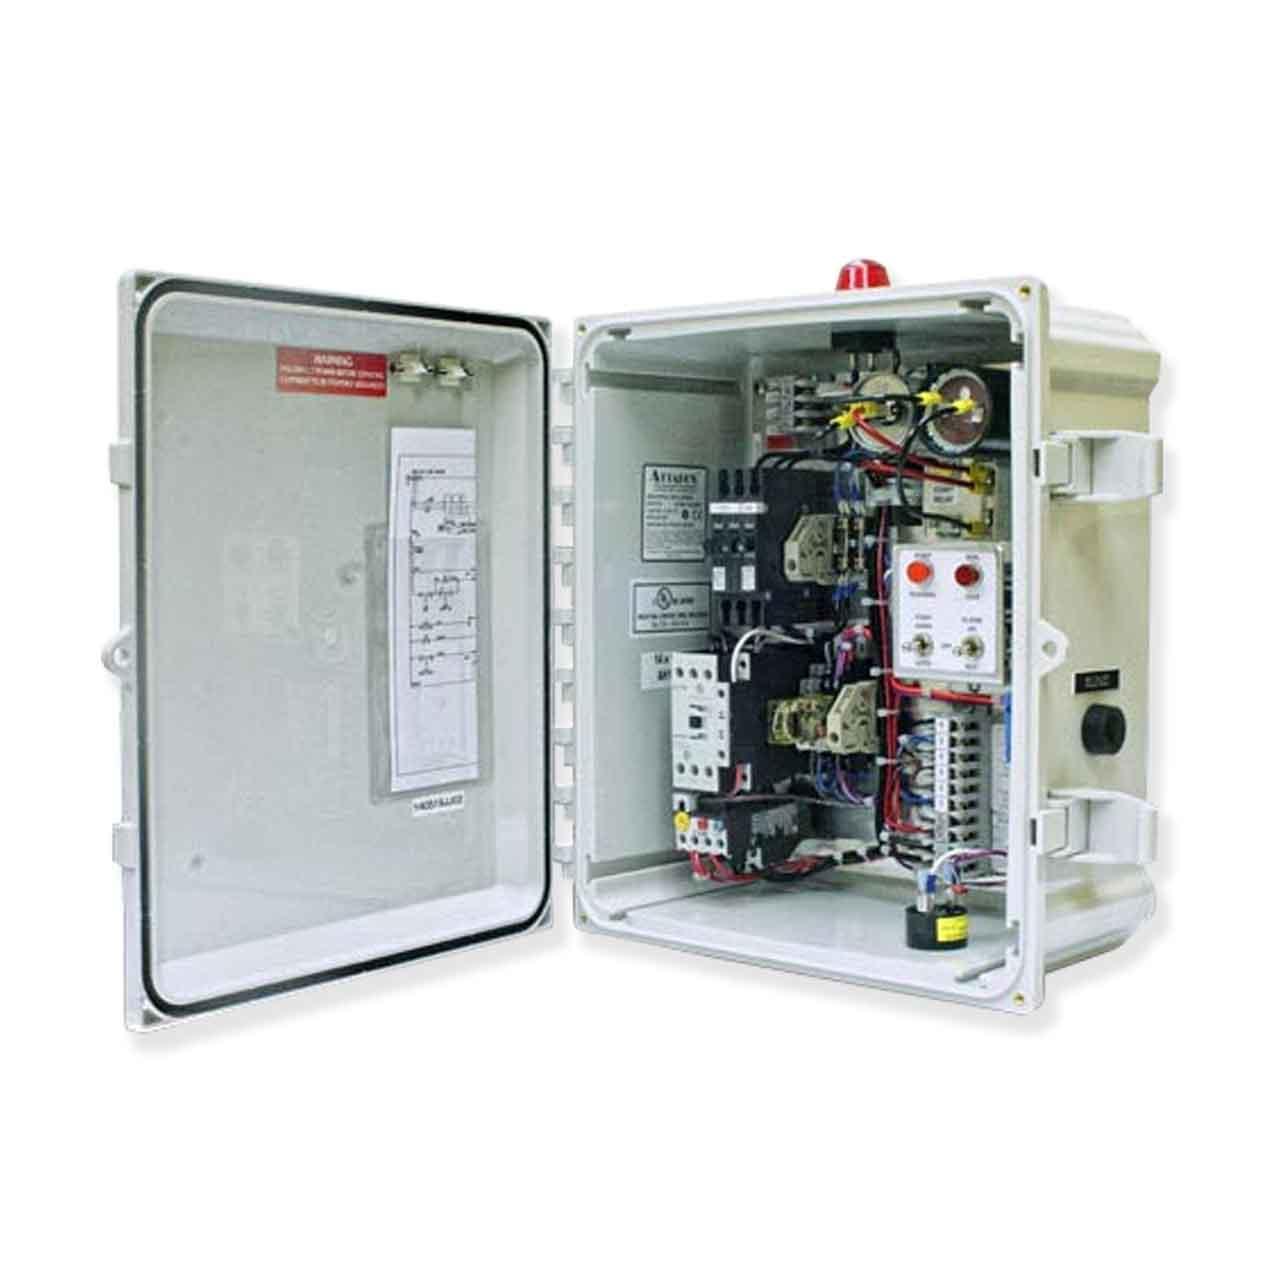 Aluminum Duplex Panels 10 Amp Barmesa Pumps BP03D4XNM010 Three Phase 208V Control Panel 3 Phase 200V 6